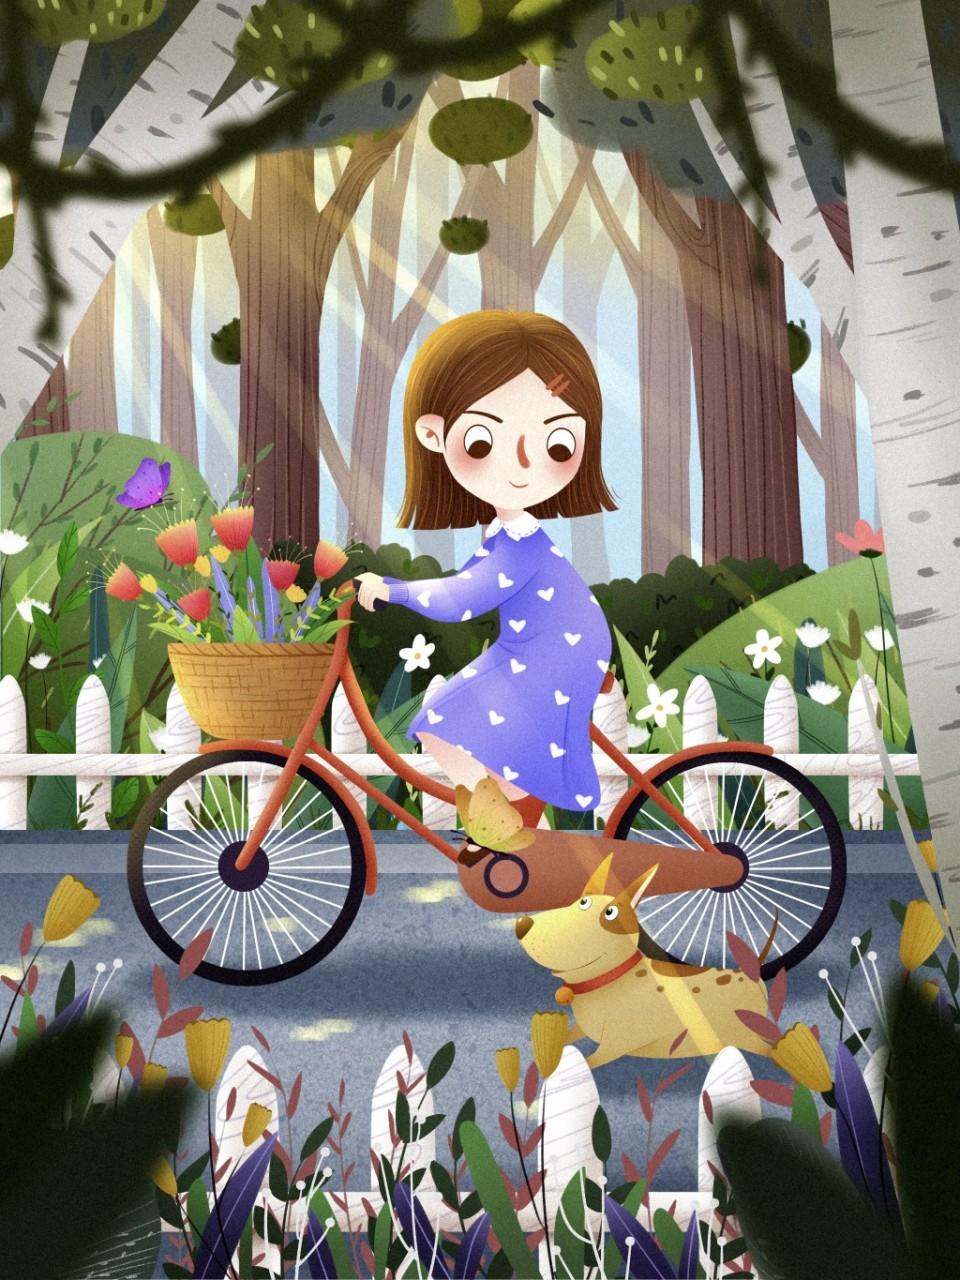 Hanna és a vadvirág